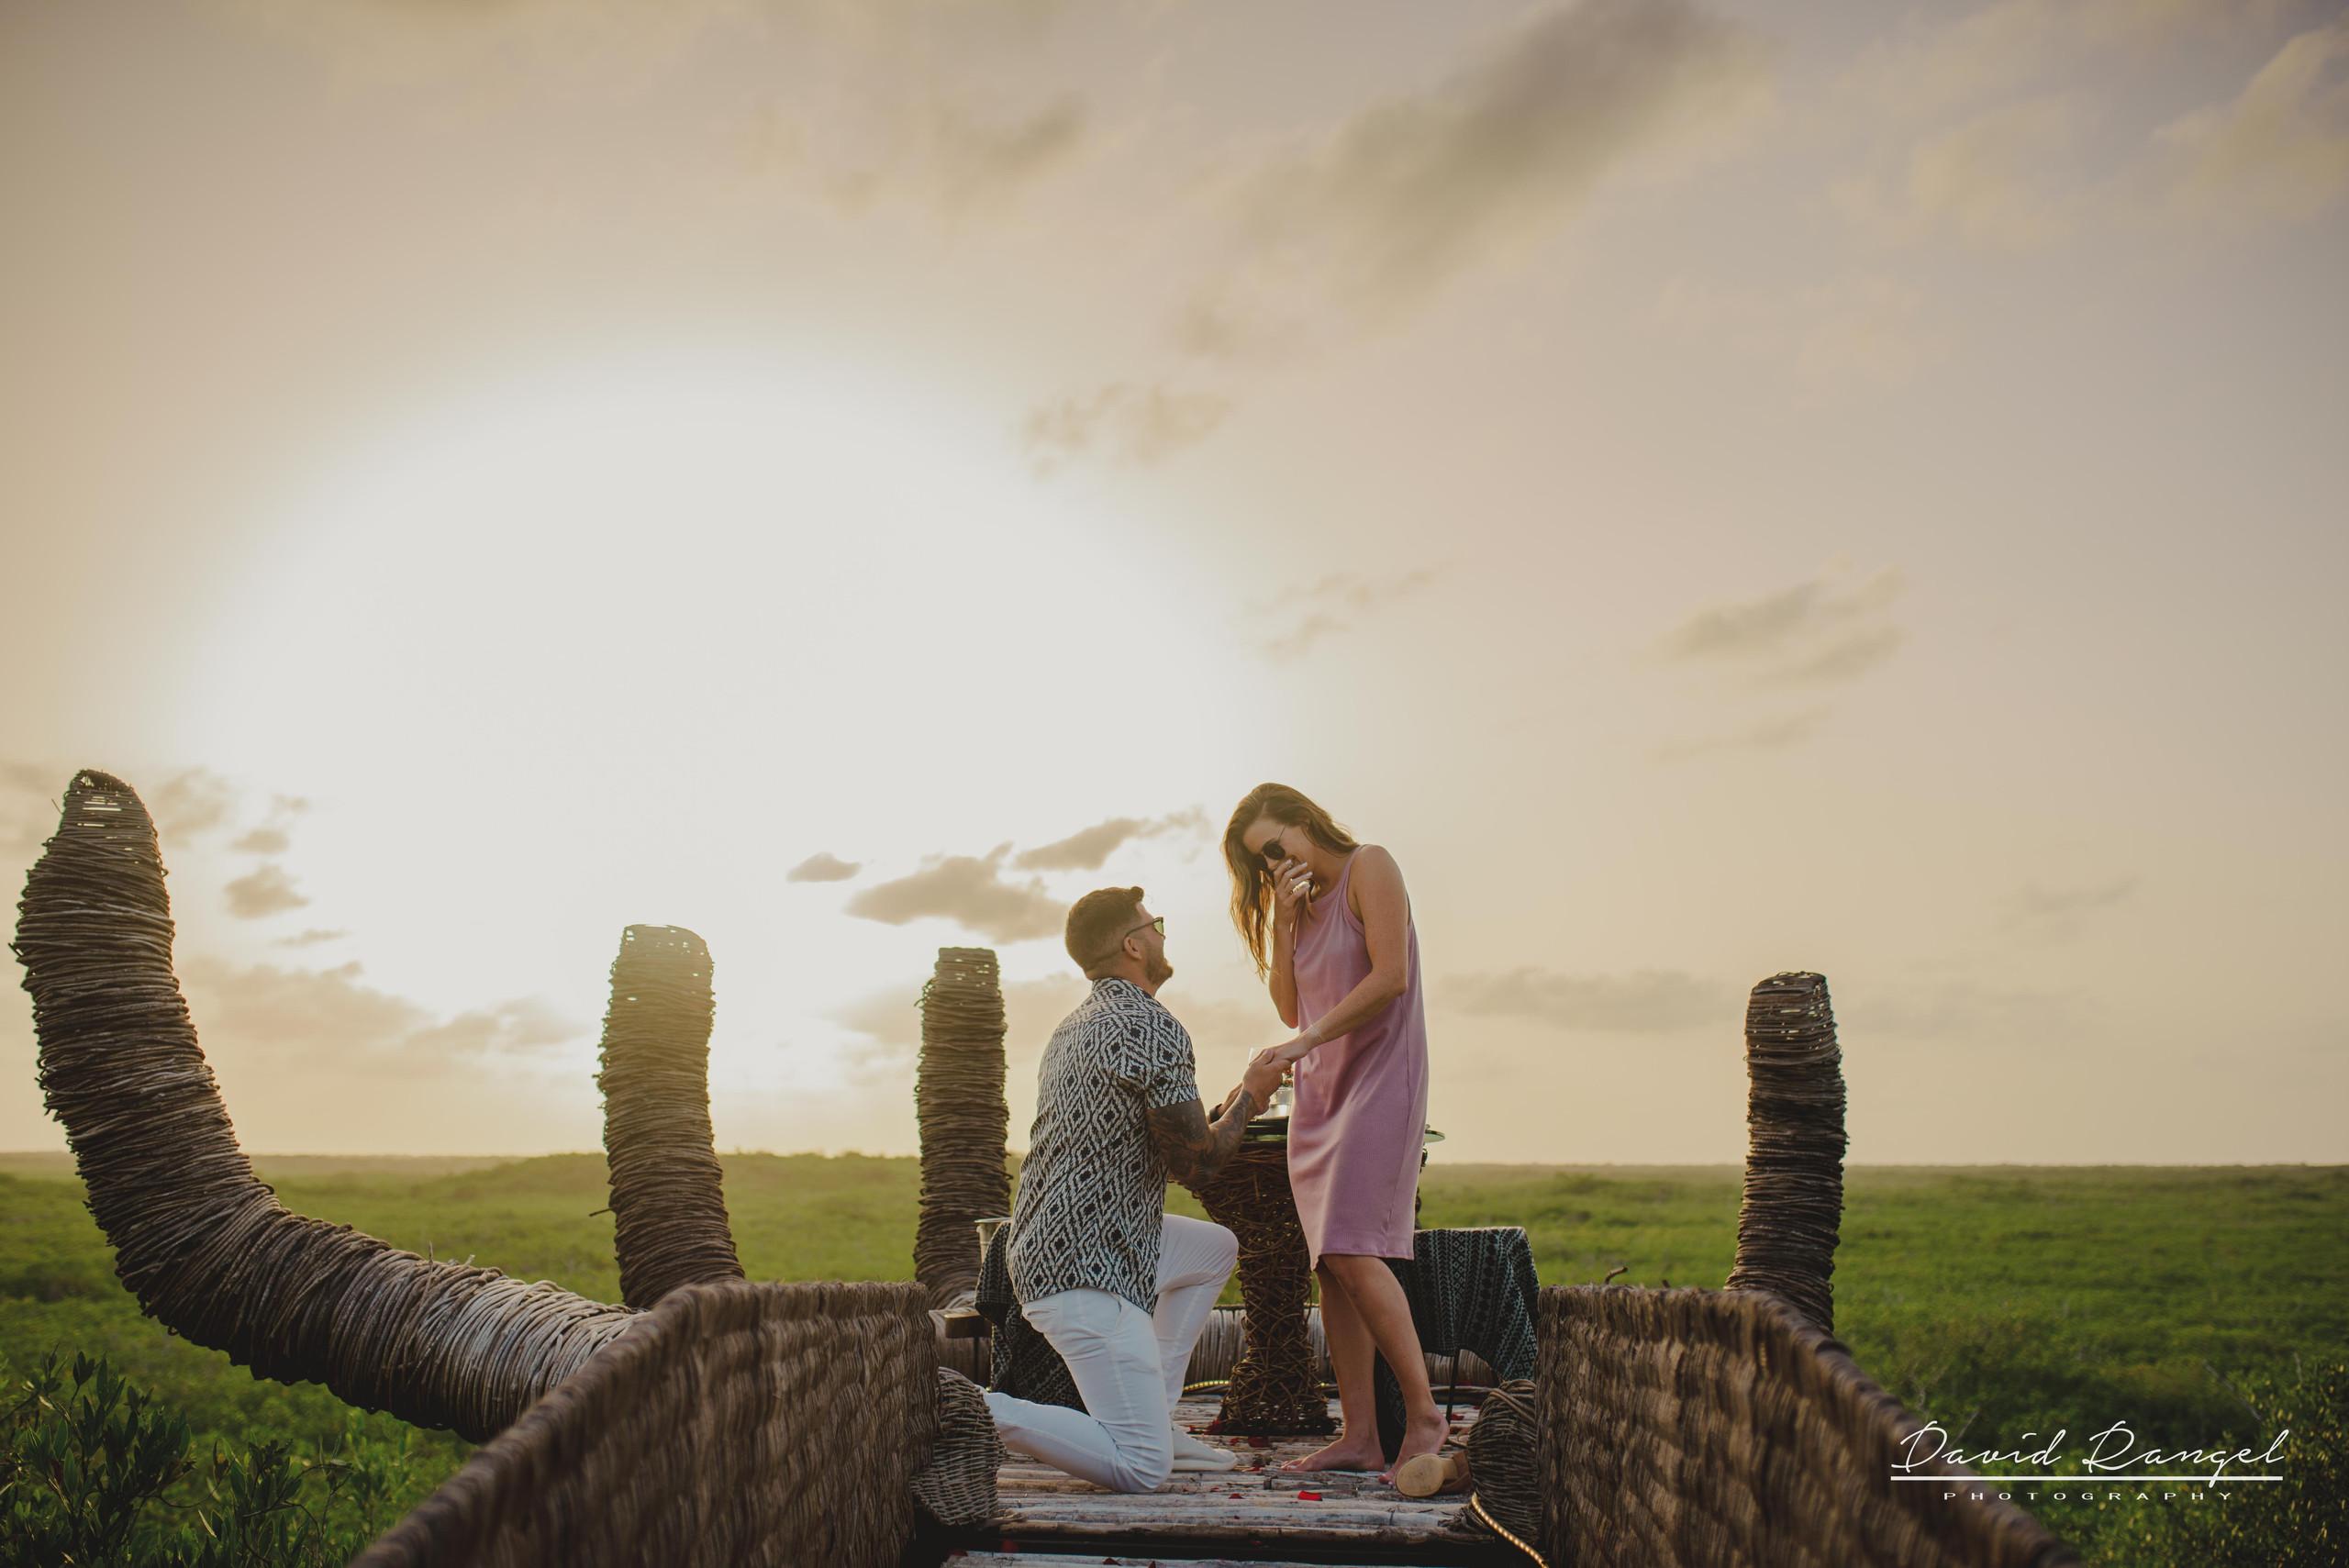 proposal+engagement+couple+dinner+hun+tulum+love+garden+nature+overthetrees+session+photoshot+destination+photographer+photo+sunset+ring